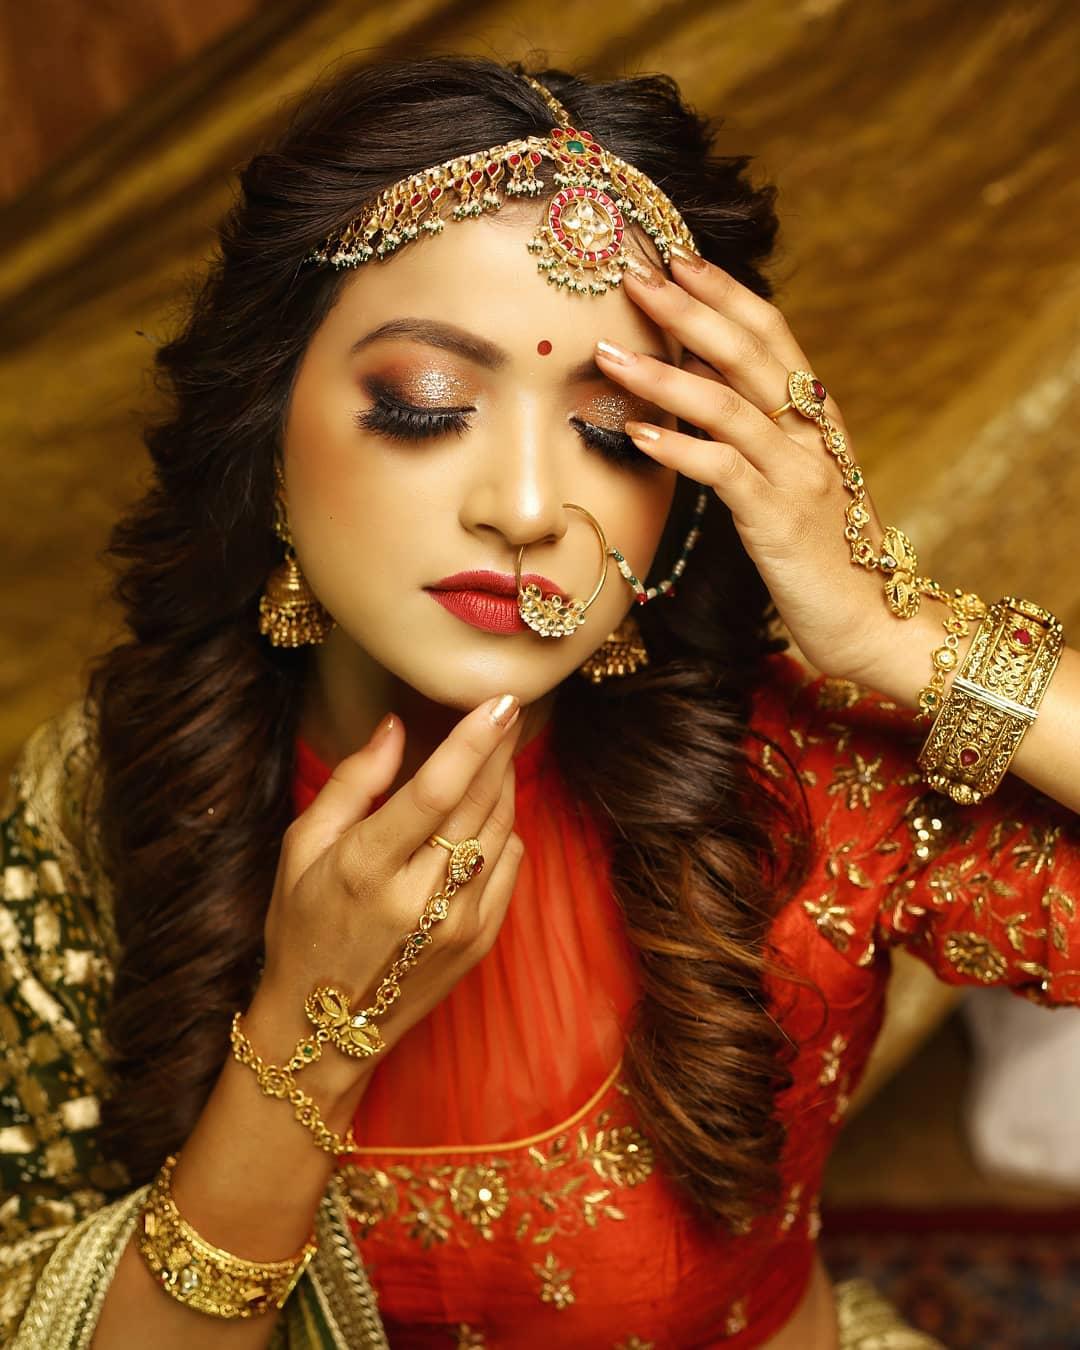 Gold hand jewelry